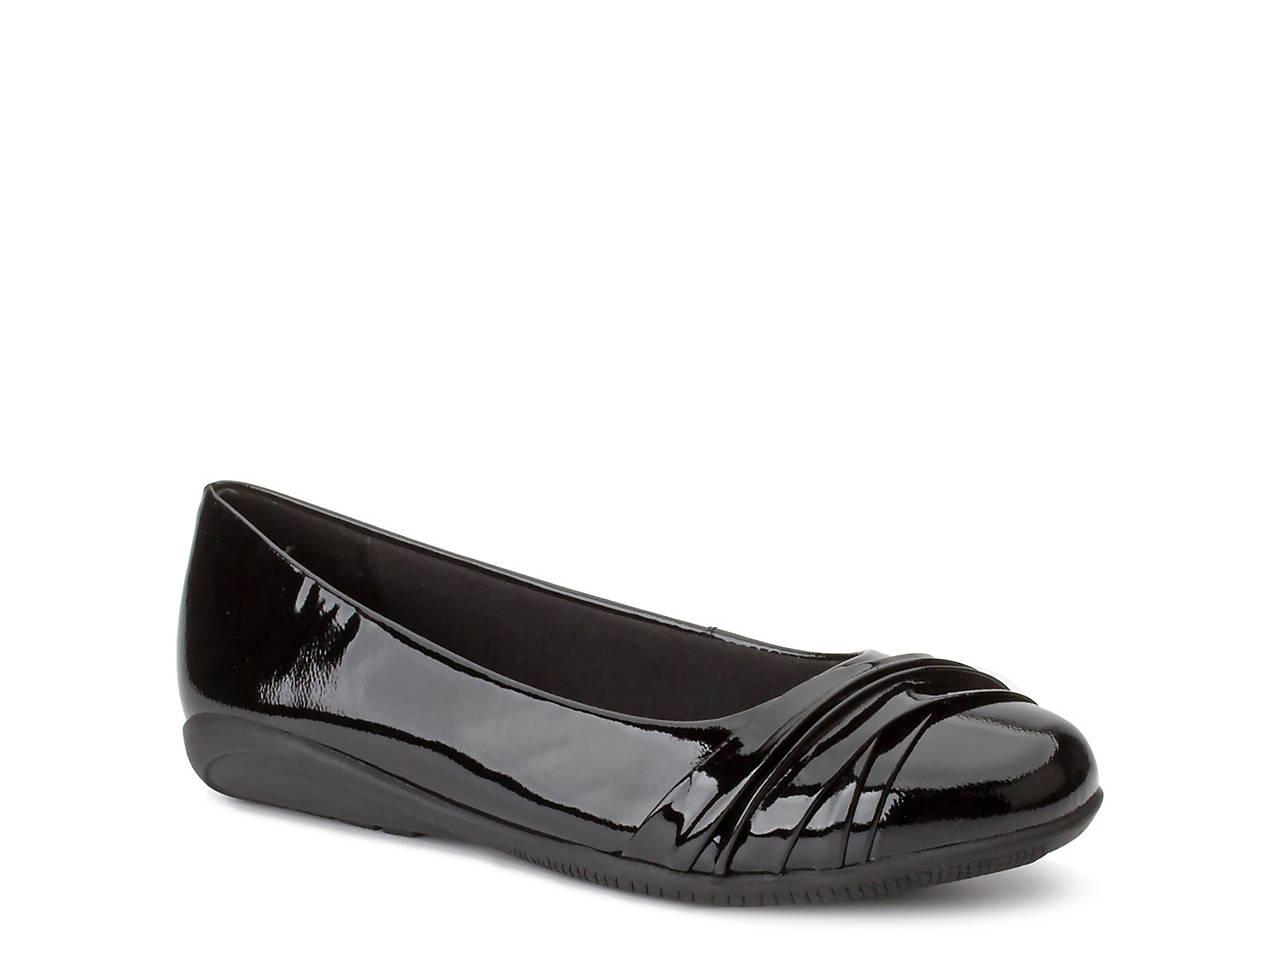 e4dc7f6c6f Walking Cradles Flick Ballet Flat Women's Shoes | DSW